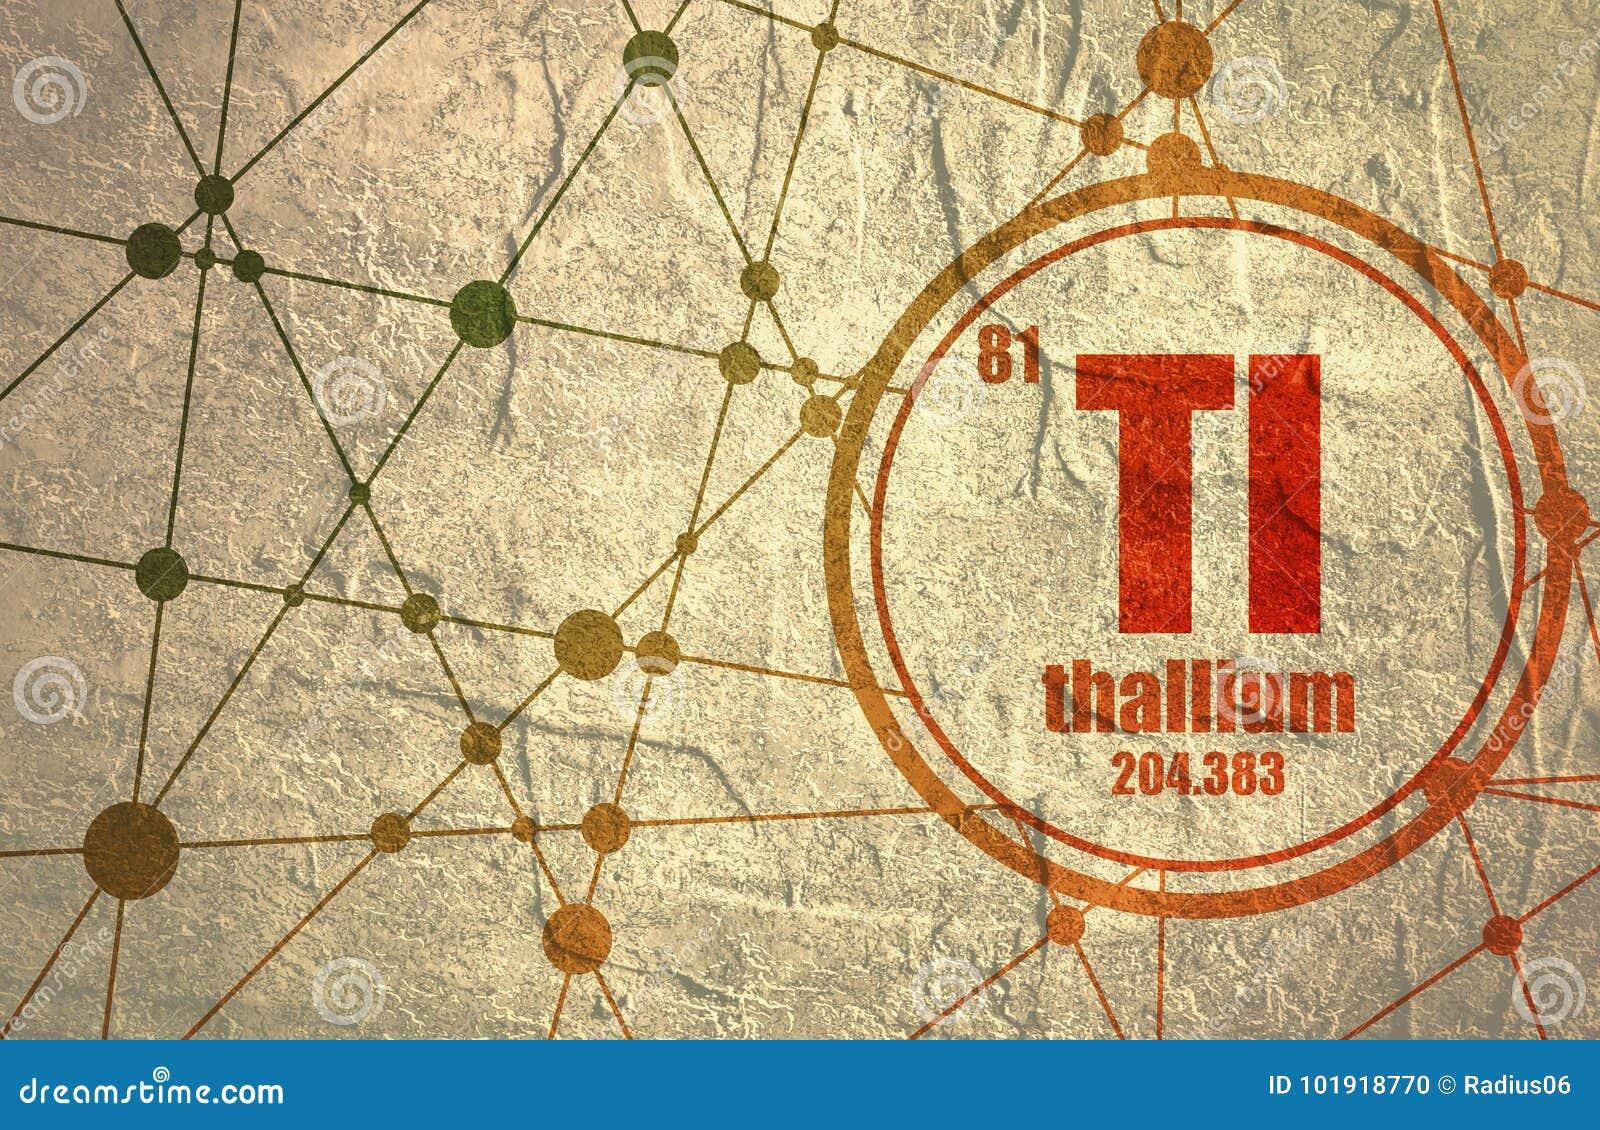 Thallium Chemical Element Stock Illustration Illustration Of